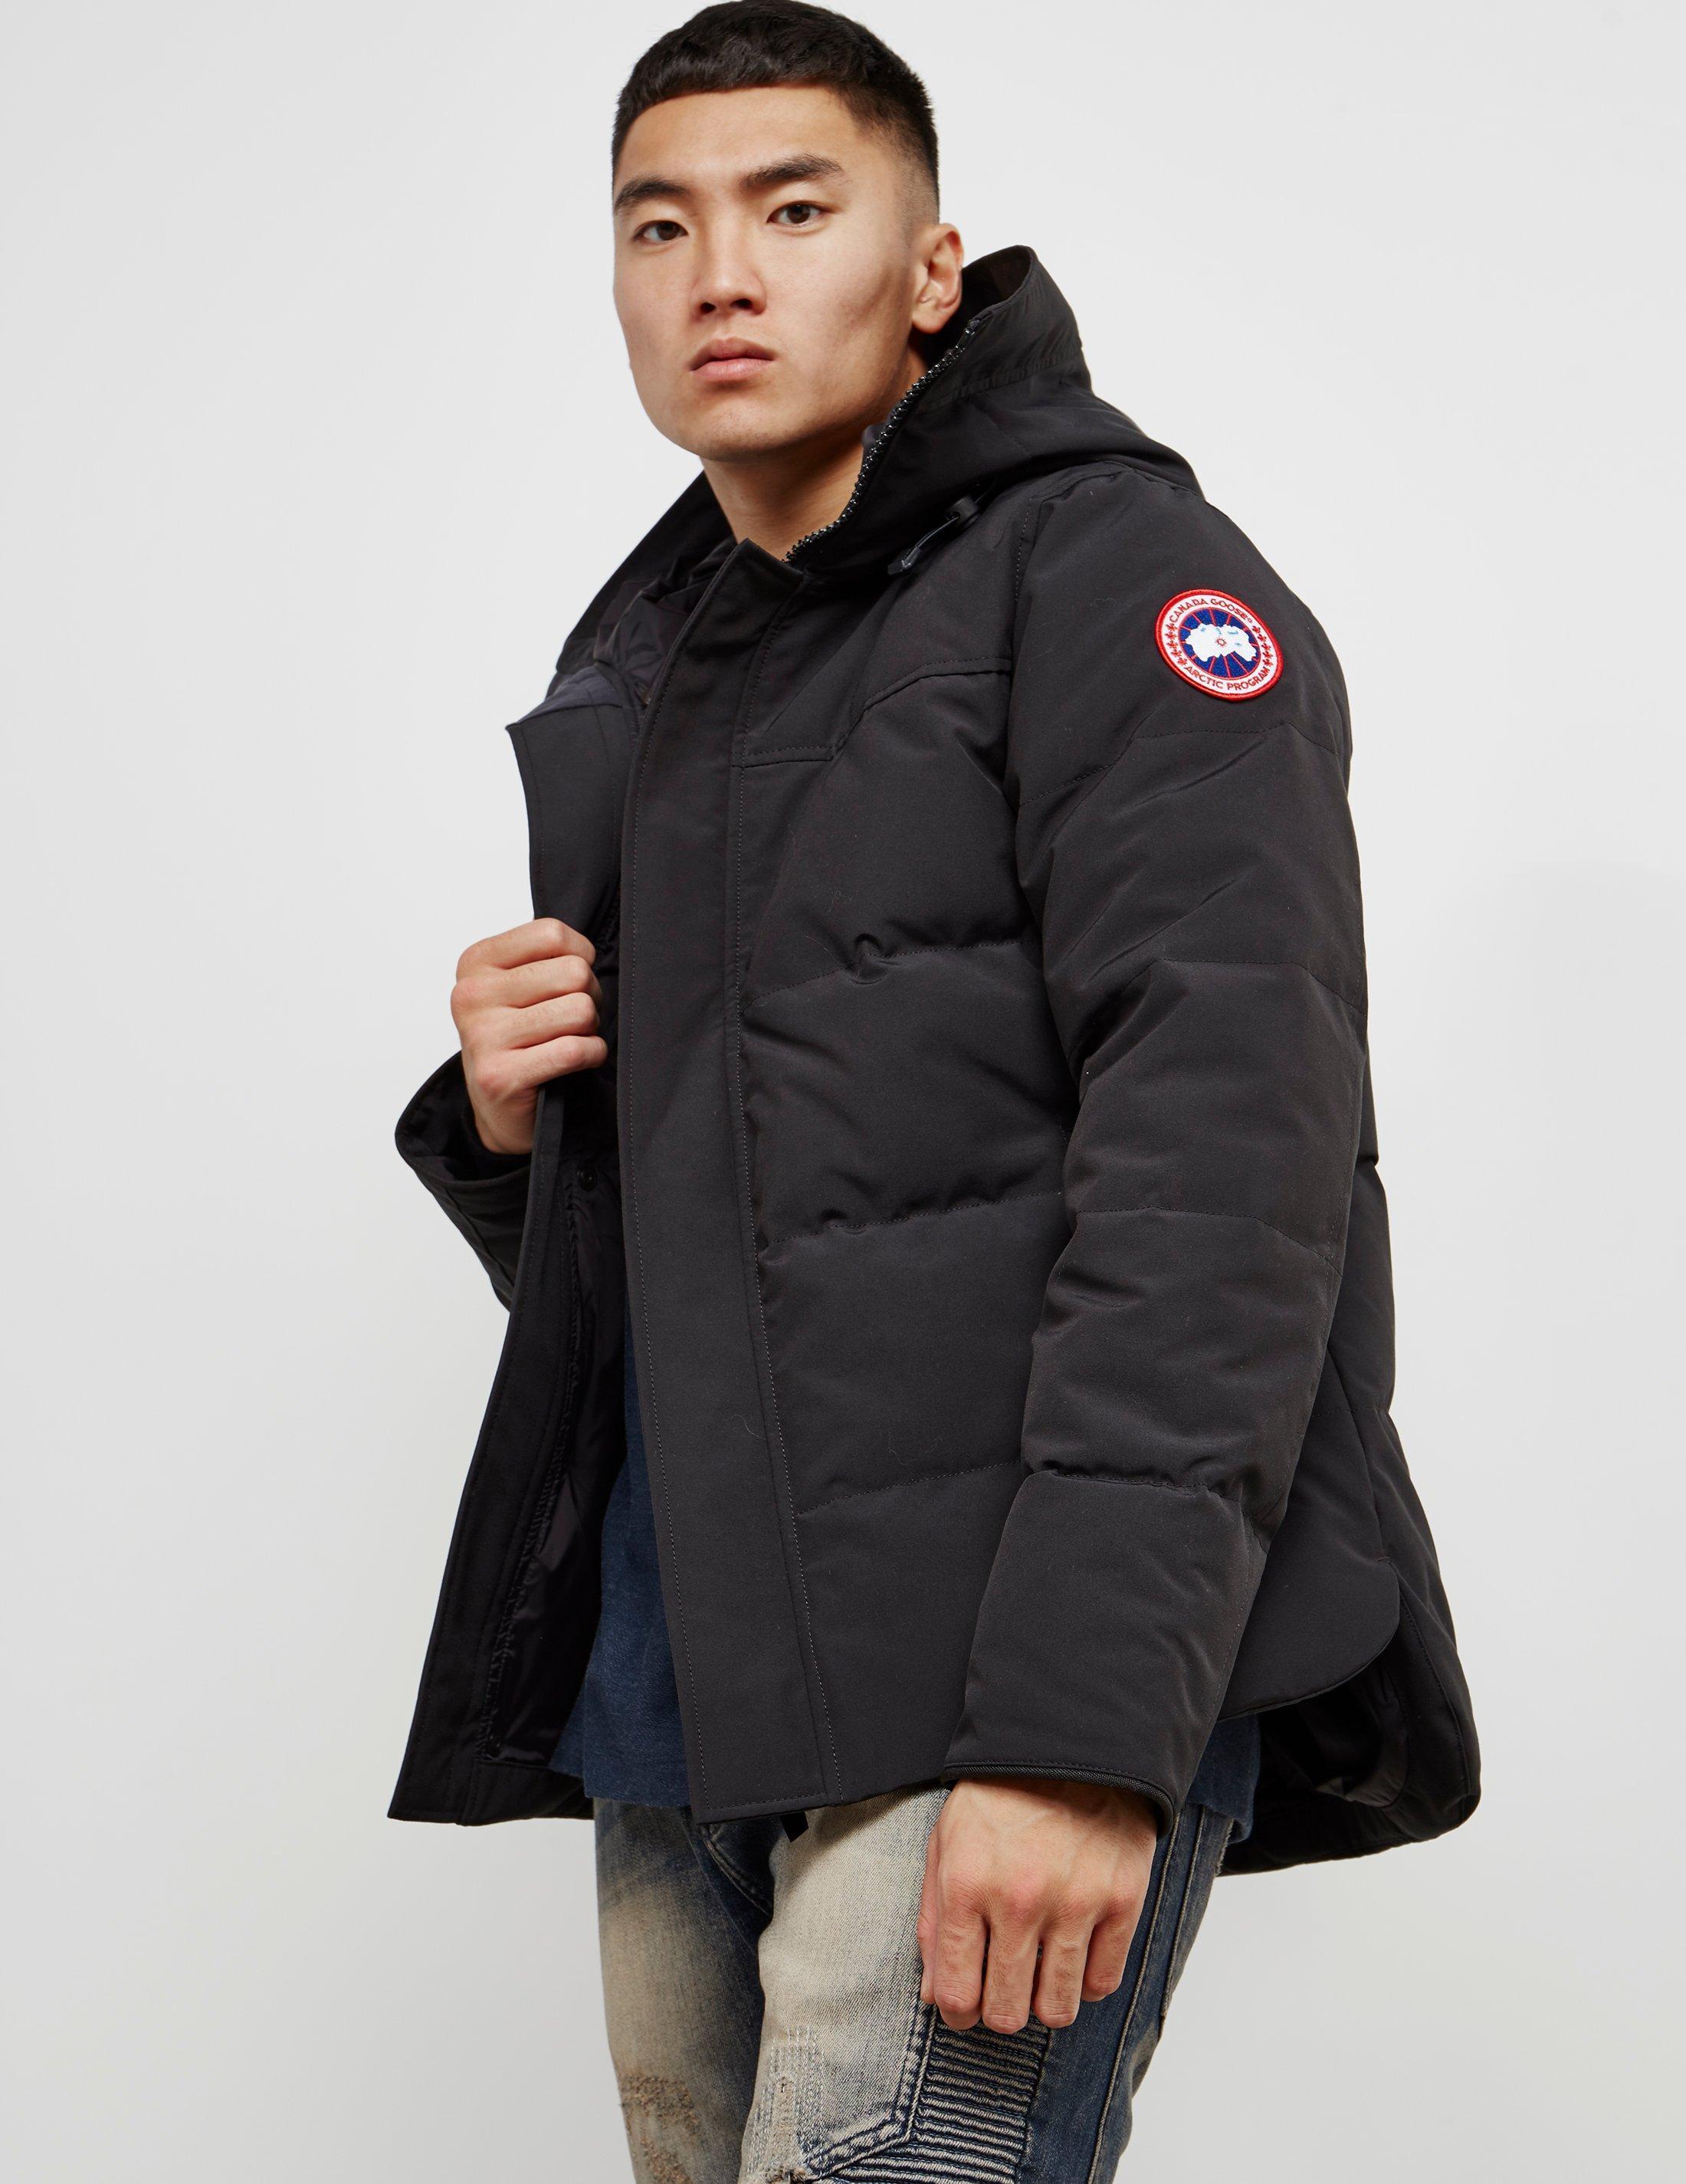 276035863994 Canada Goose Macmillan Padded Parka Jacket Black in Black for Men ...